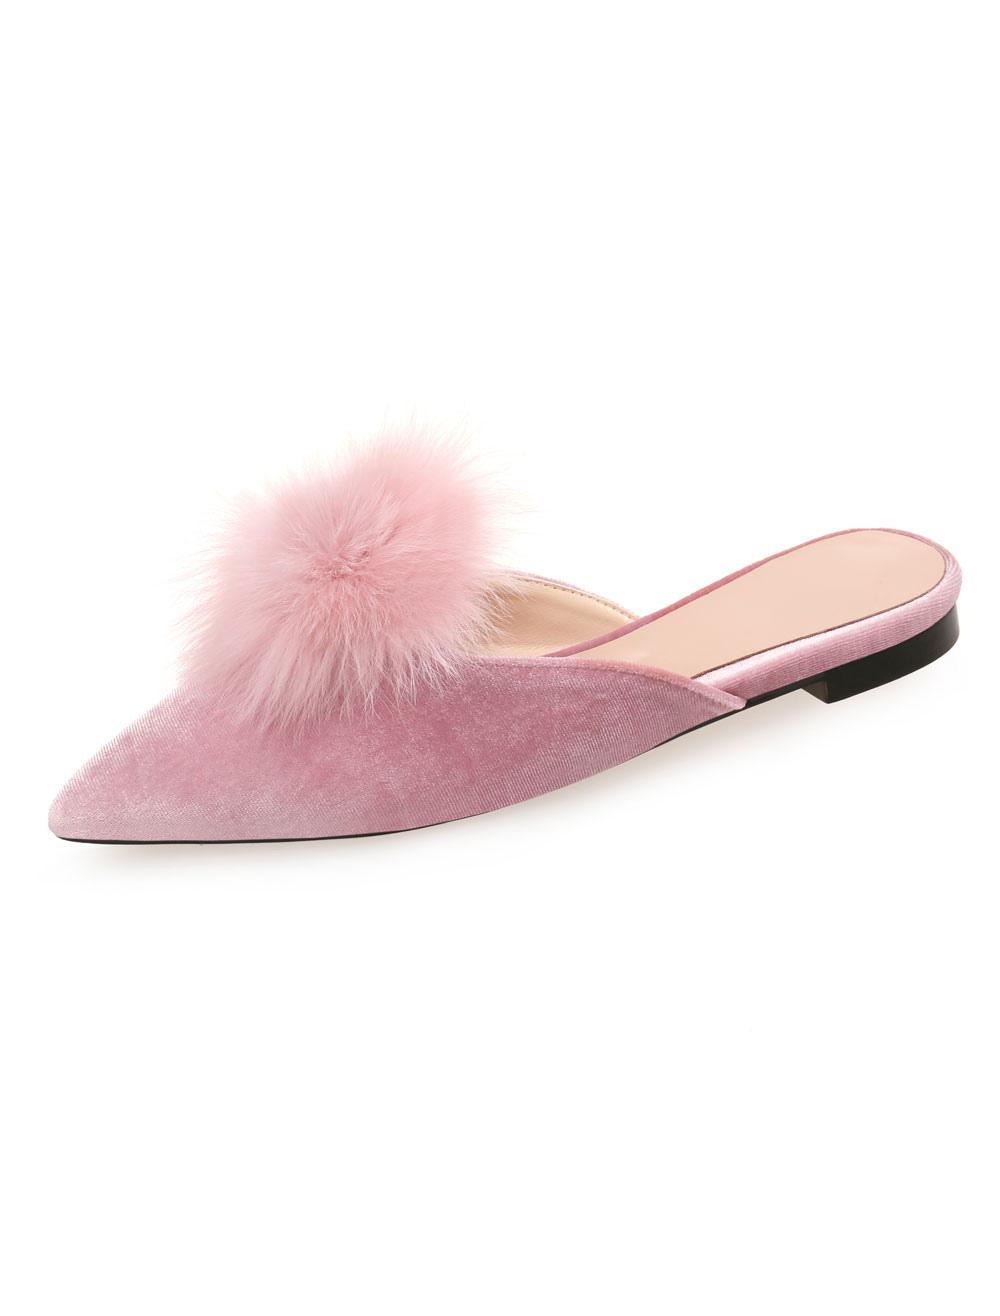 Women Flat Mules Pink Velvet Pointed